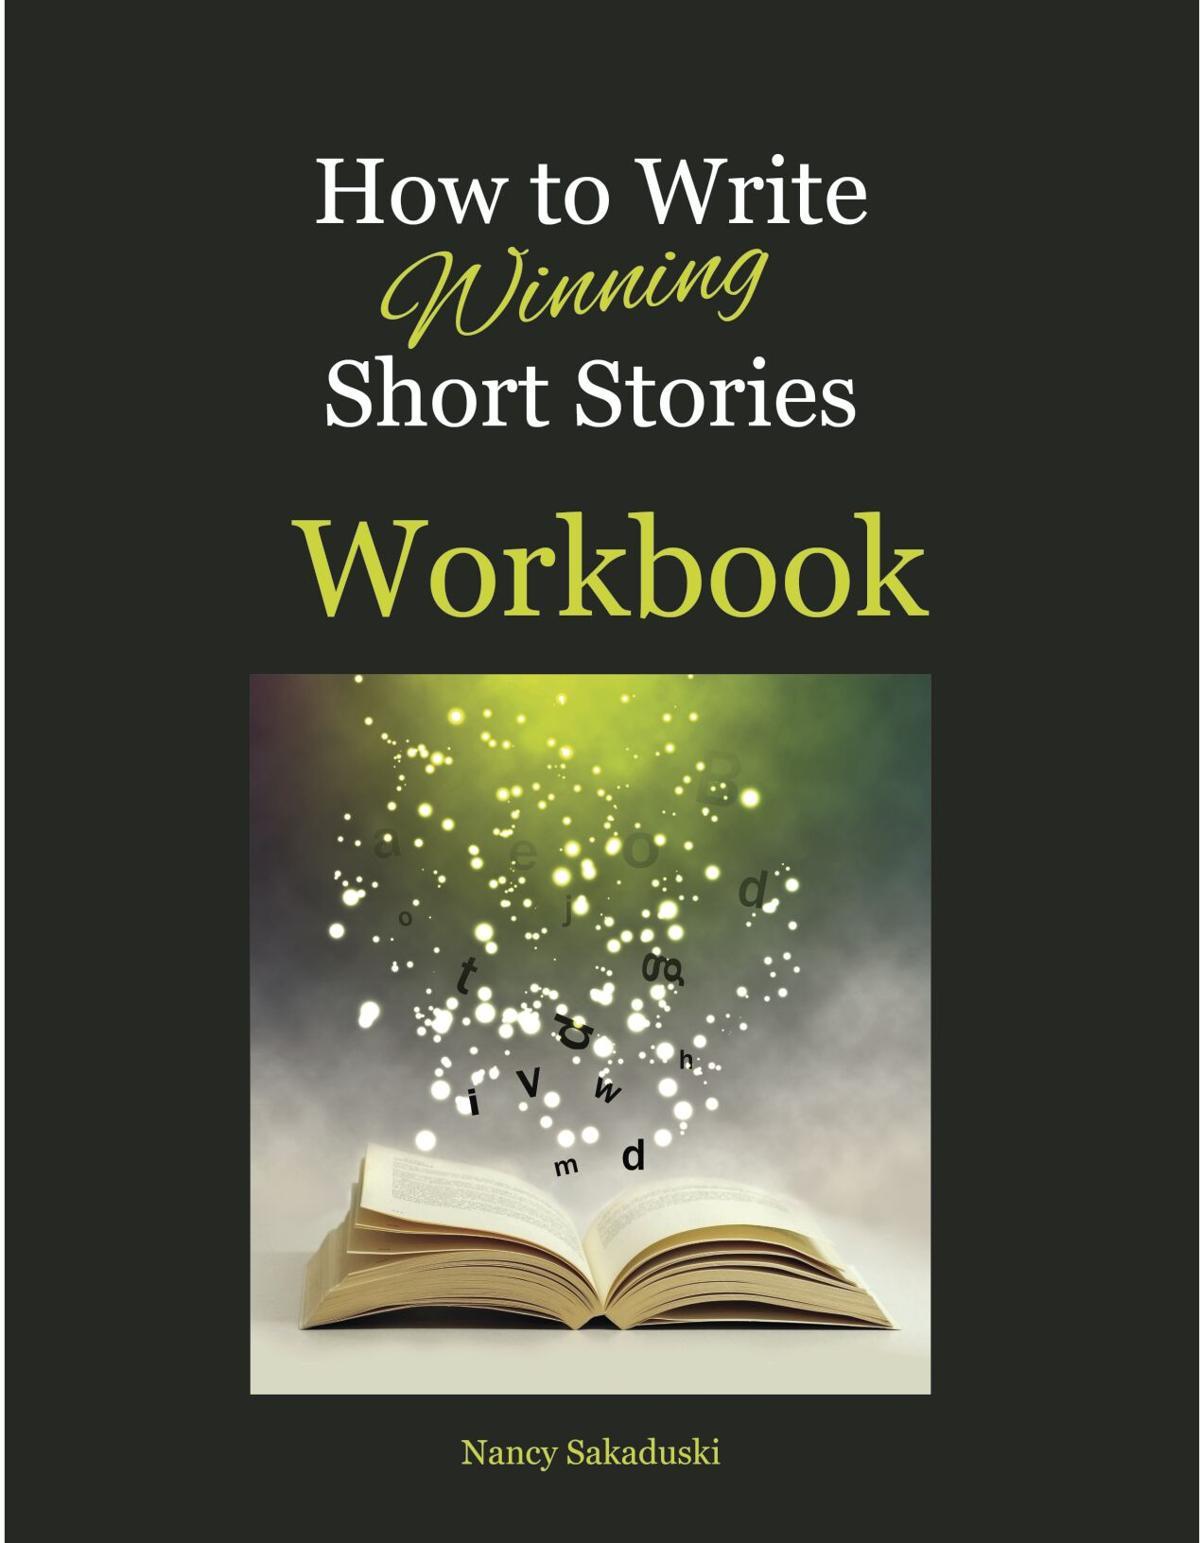 Workbookcover.jpg